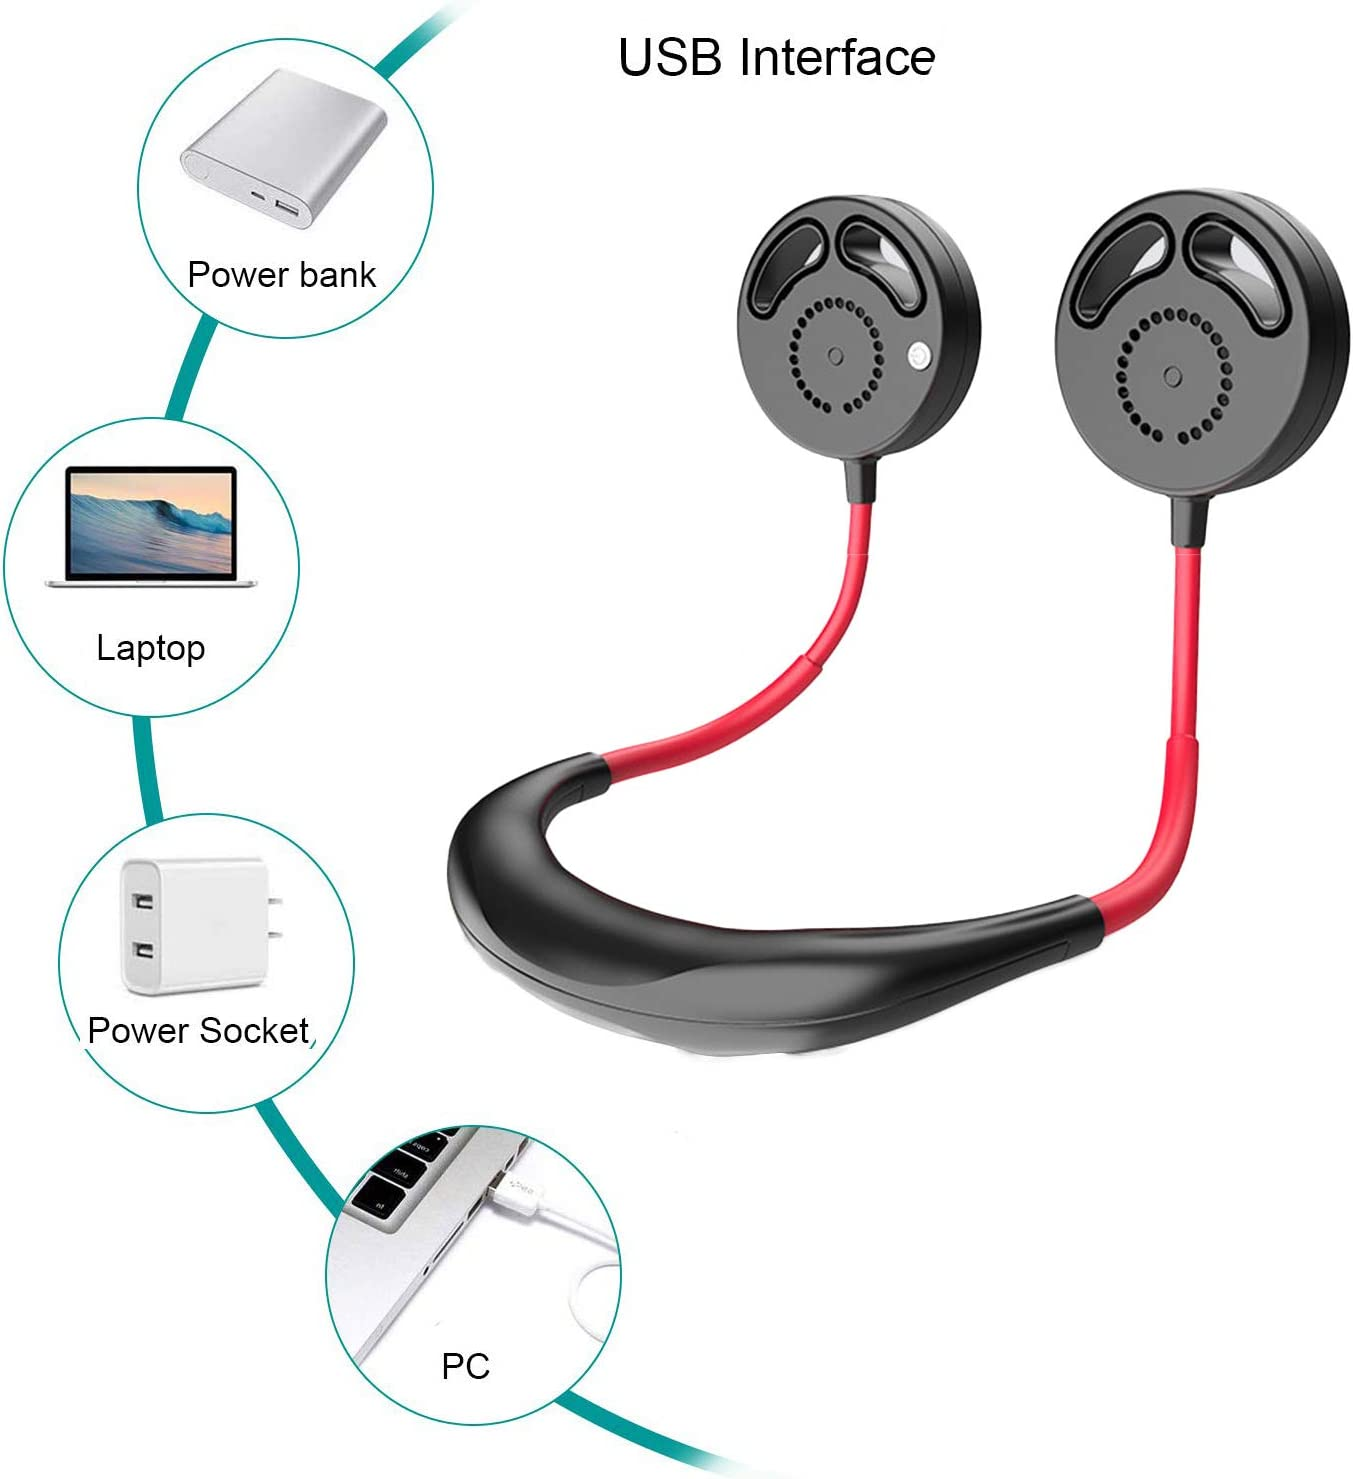 Dibiao Hanging Neckband Fan,USB Hands-Free Dual-Head Bladeless Sports Fan for Outdoor Travel Office